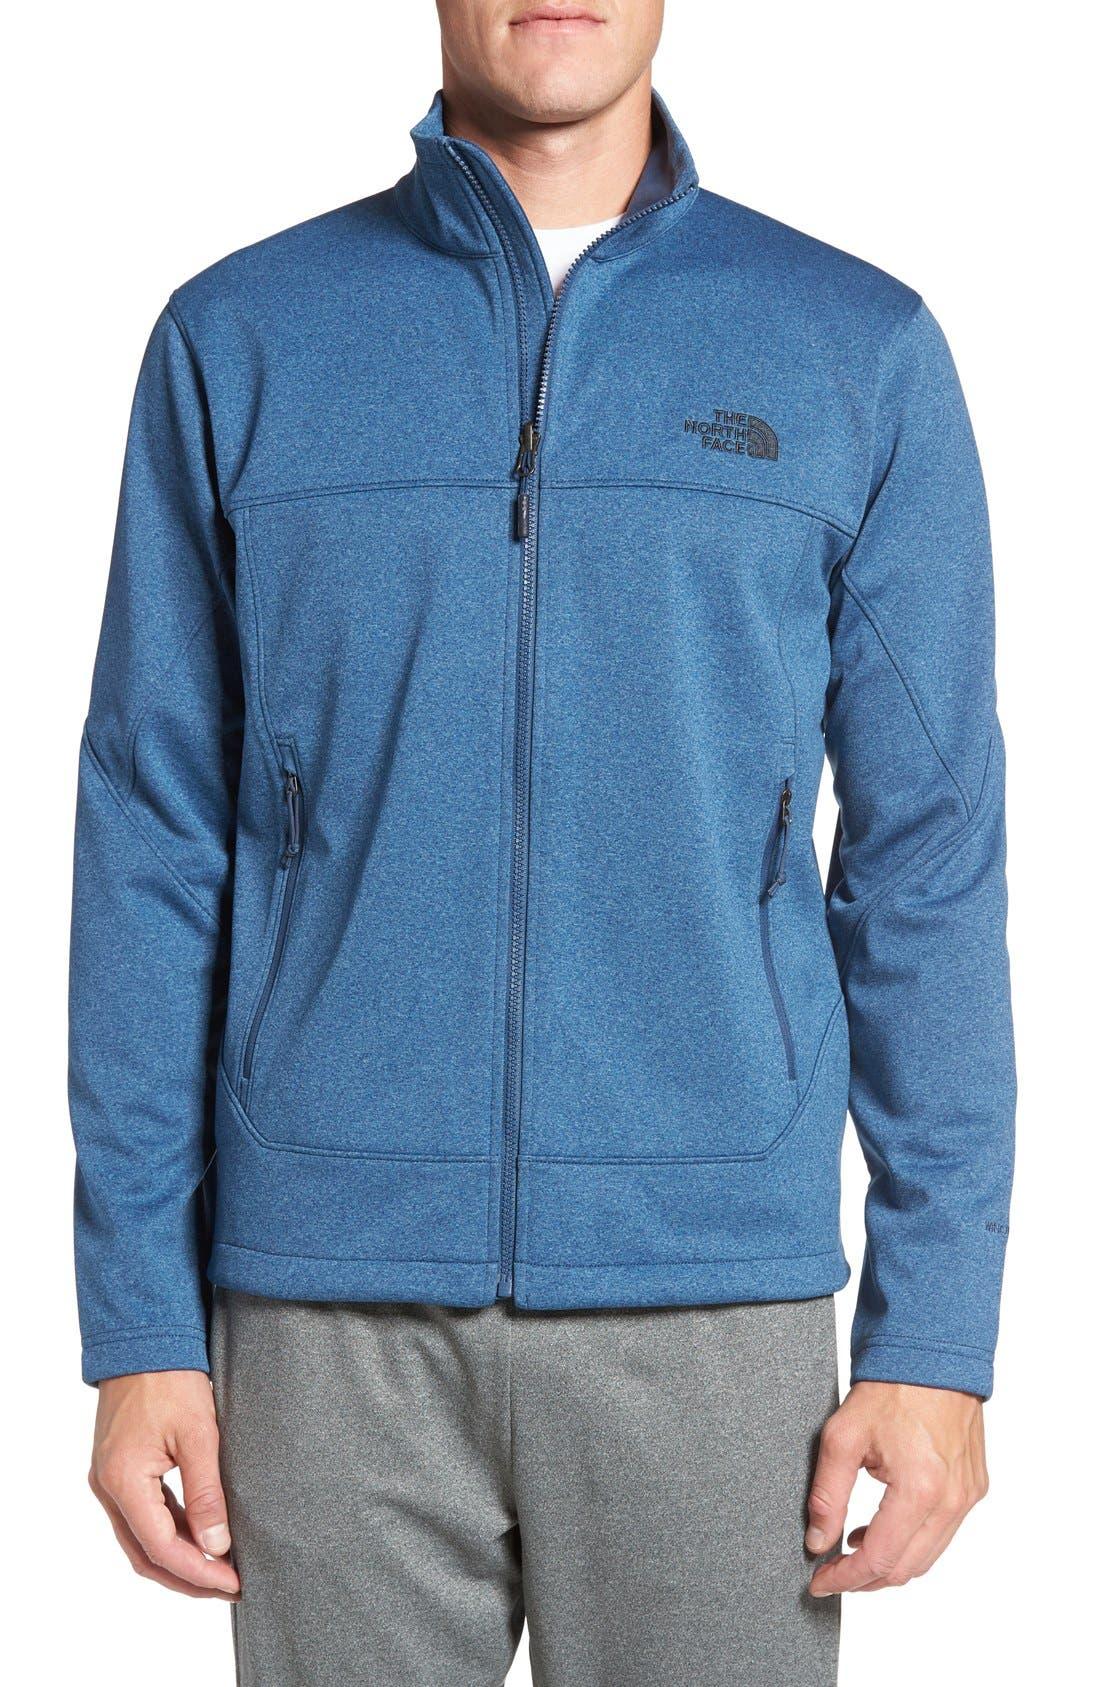 Main Image - The North Face 'Canyonwall' Fleece Jacket